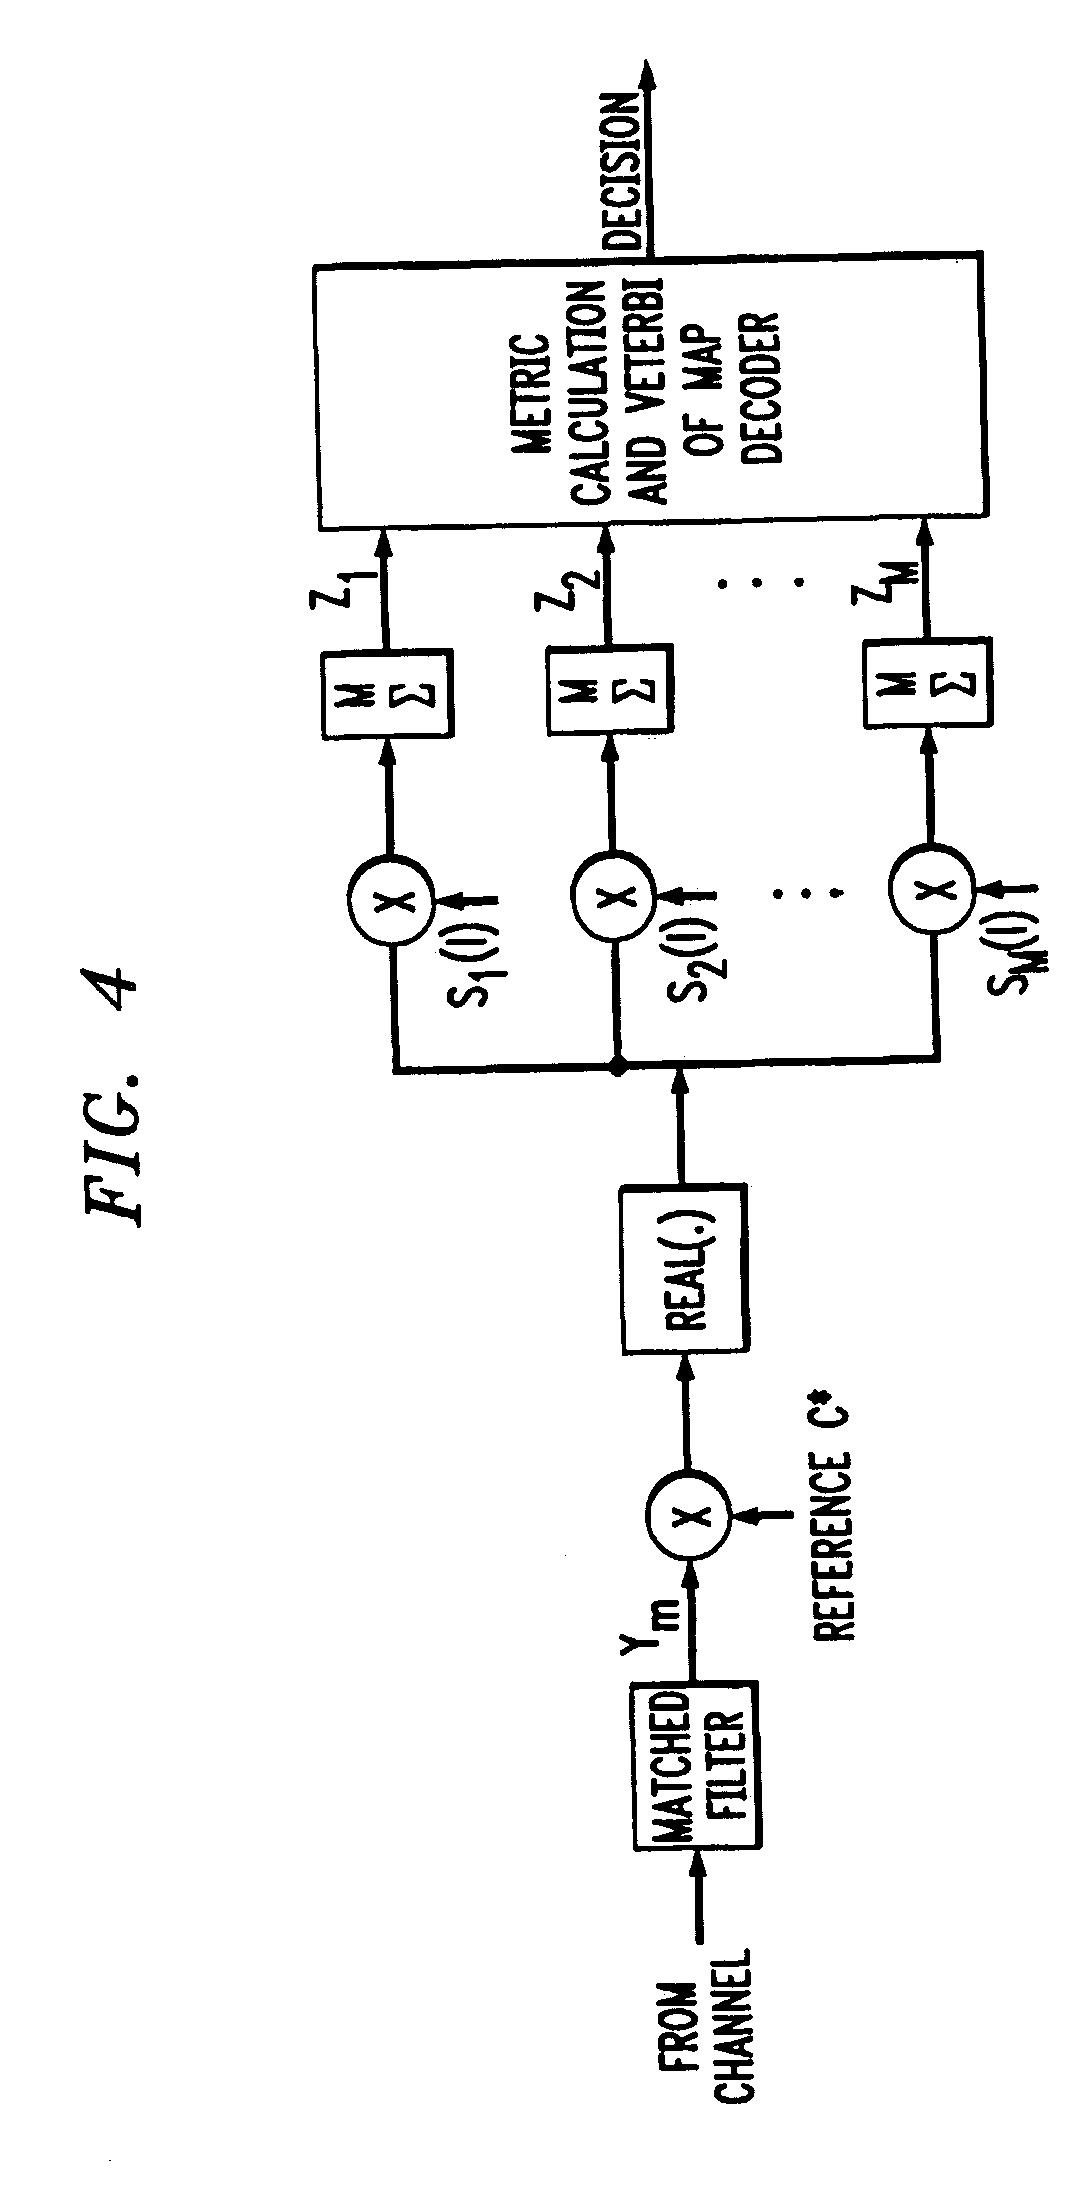 flow diagram vs value stream map , 1997 nissan quest wiring diagram ,  bobcat 743 altenator wiring diagram , melex solenoid wiring diagram model  212